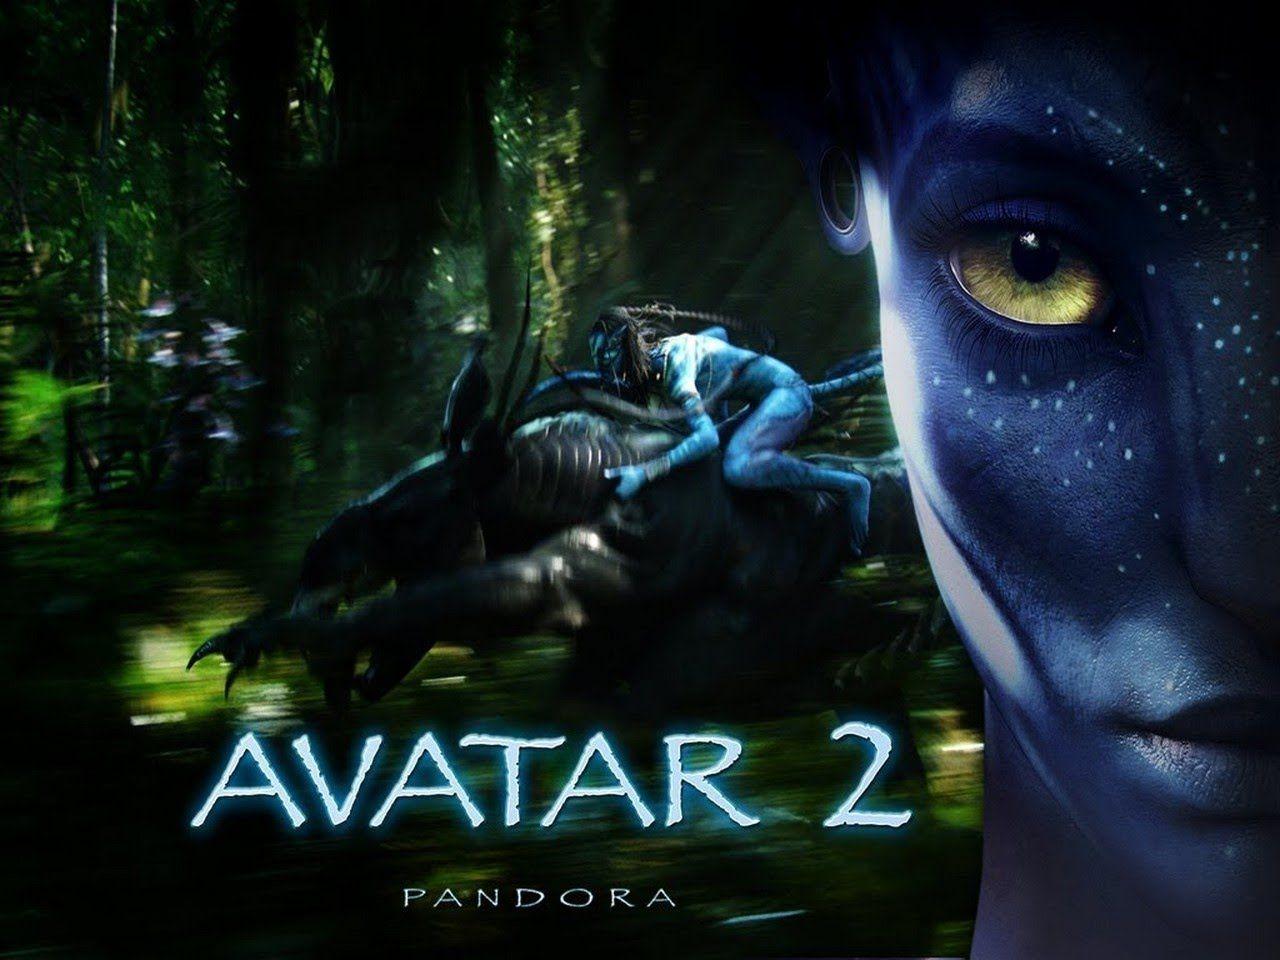 avatar 2 trailer 2018 | upcoming movie 2018 | avatar 2 | pinterest